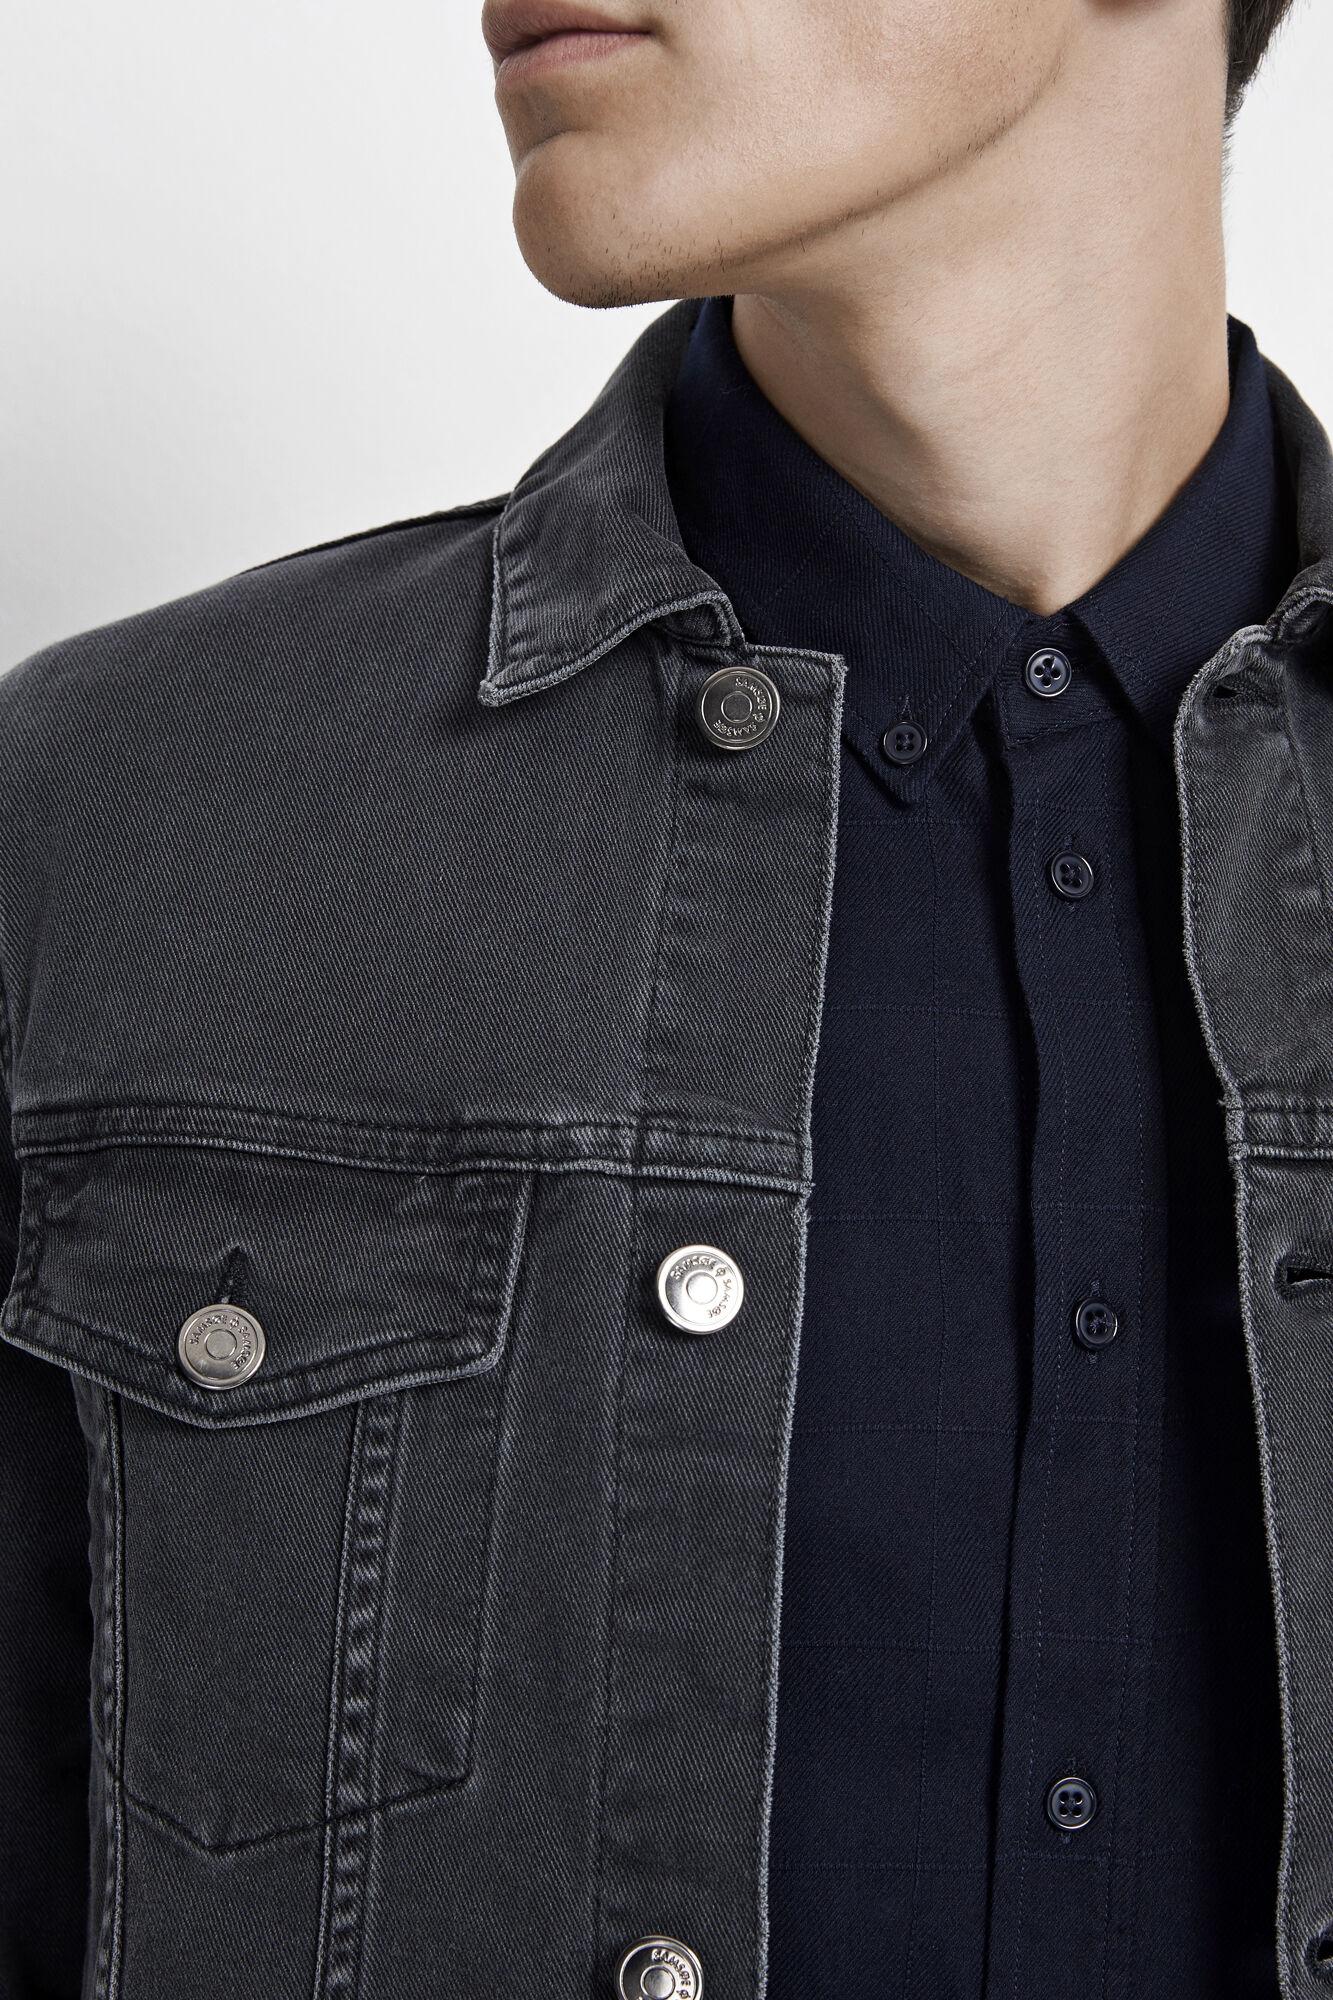 Laust jacket 7745